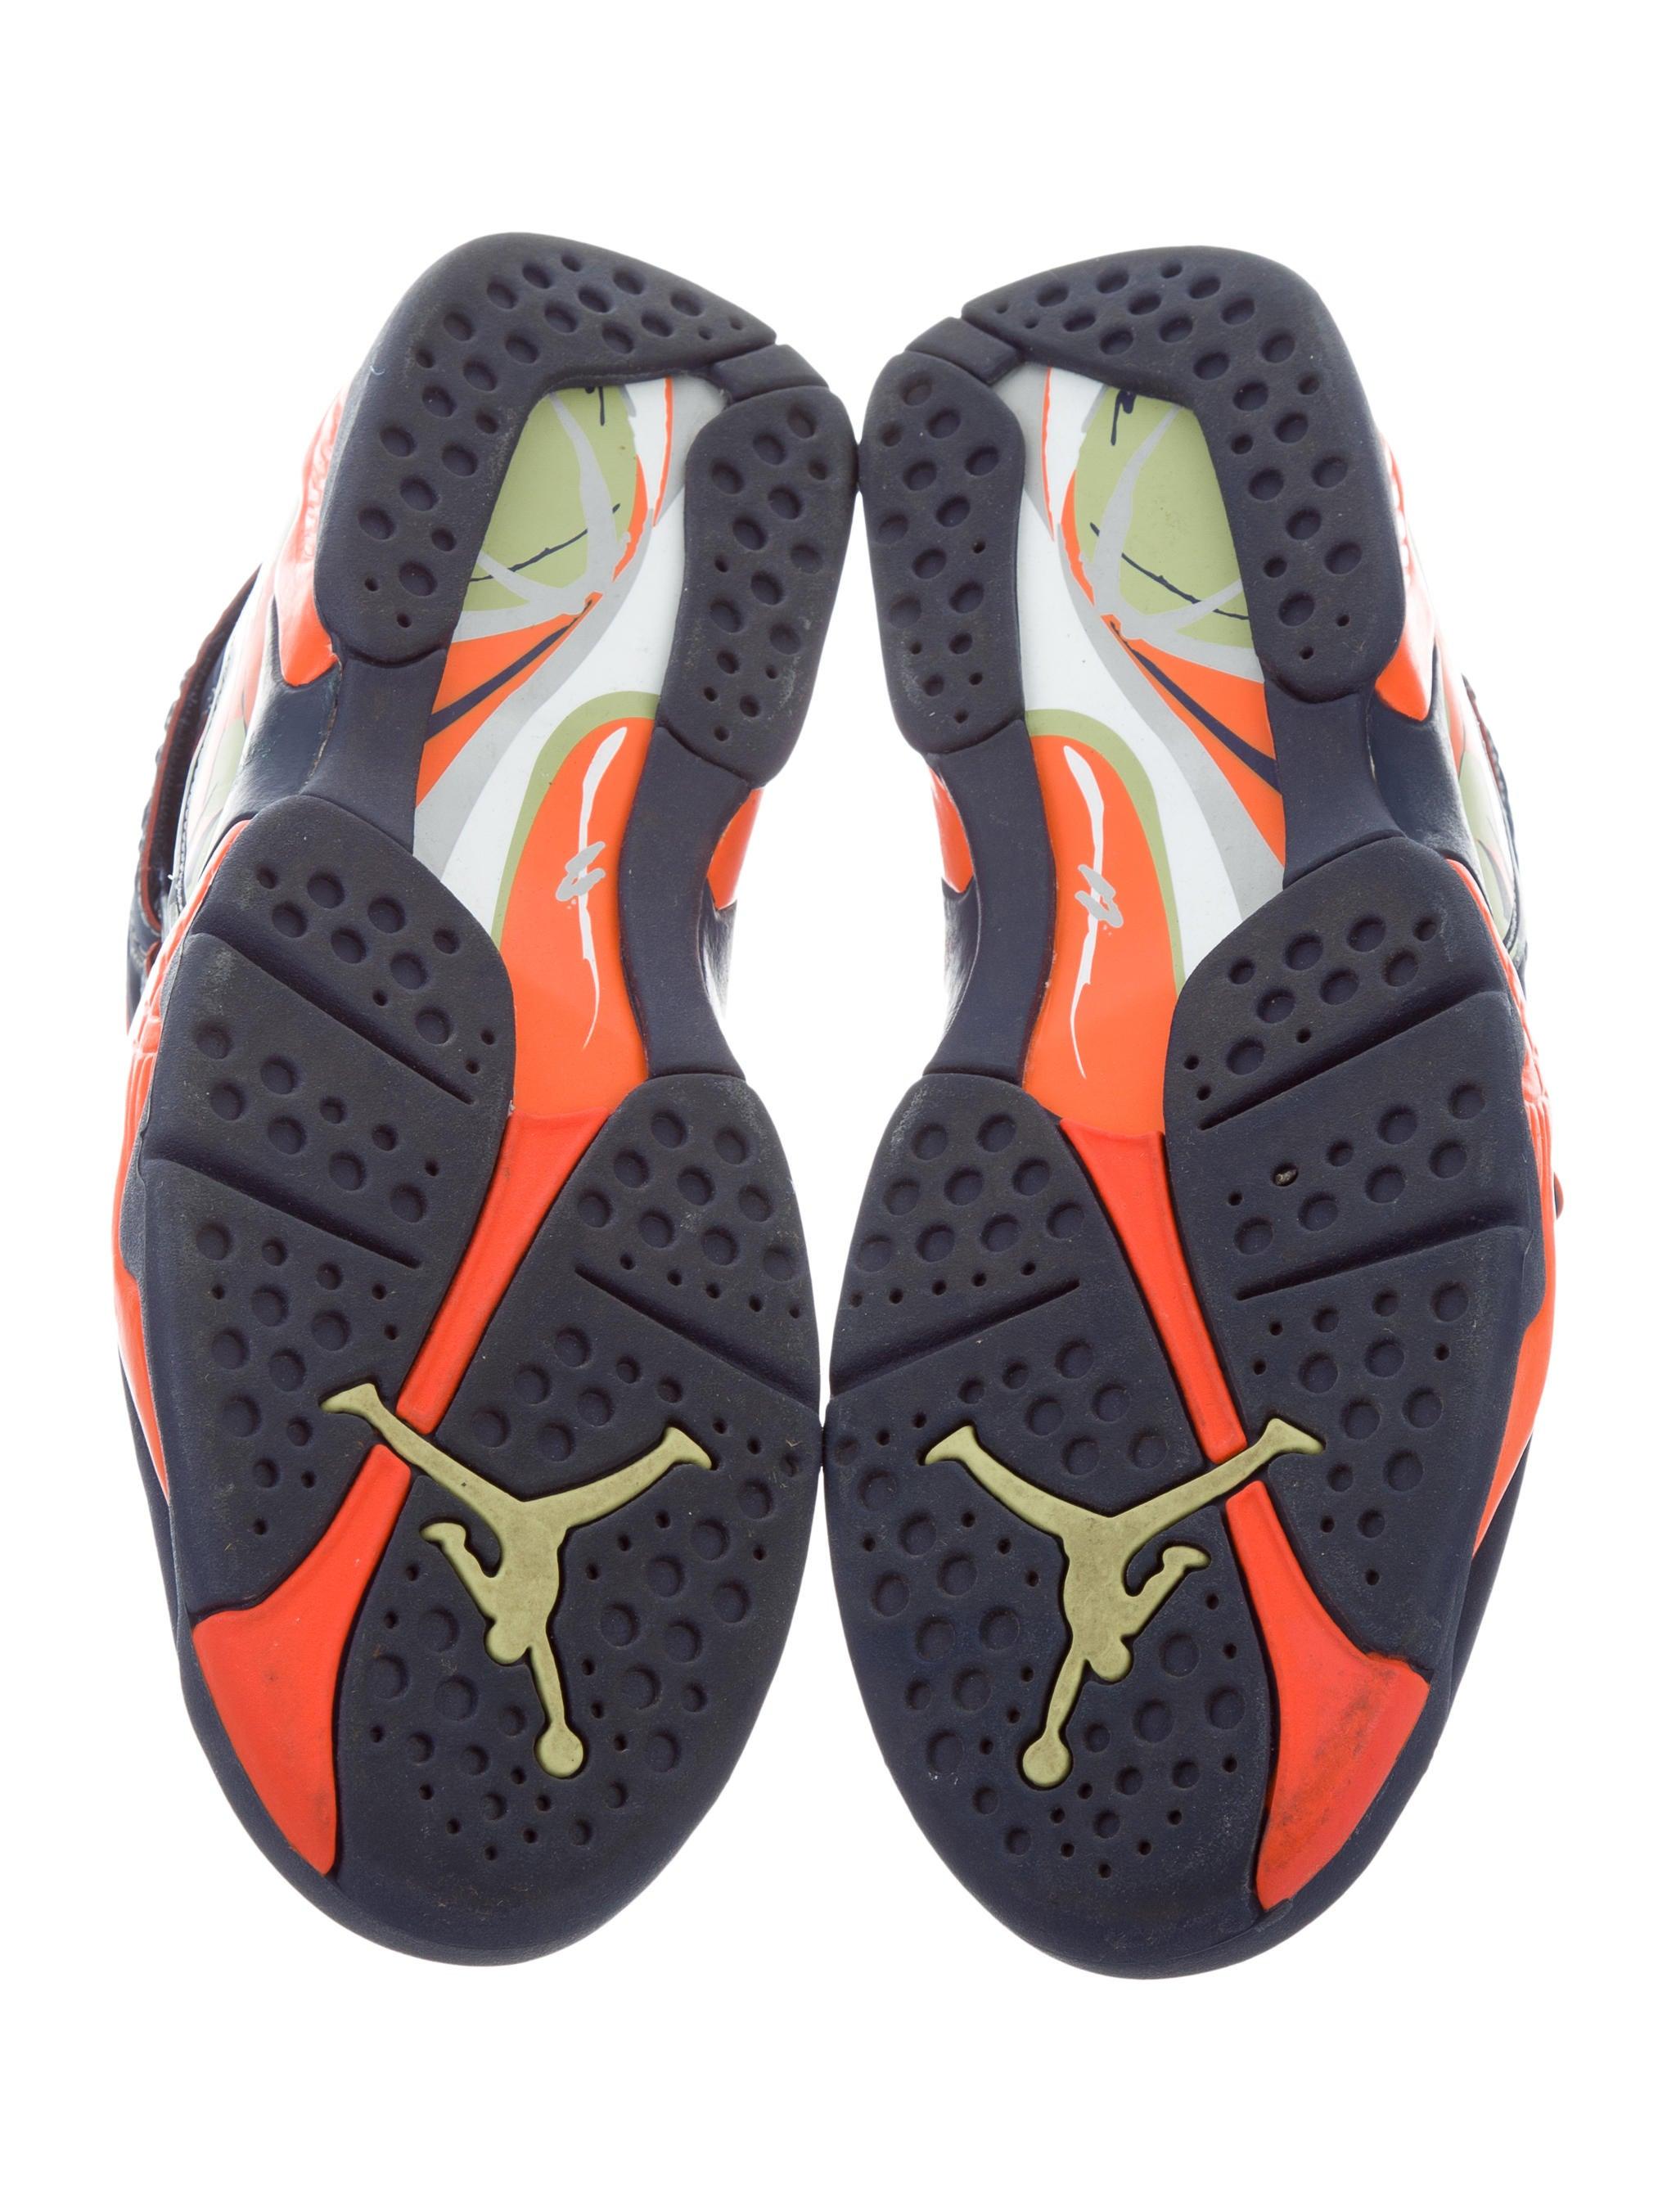 Nike Air Max Shake Evolve Dennis Rodman - Notary Chamber 5b2a9e775